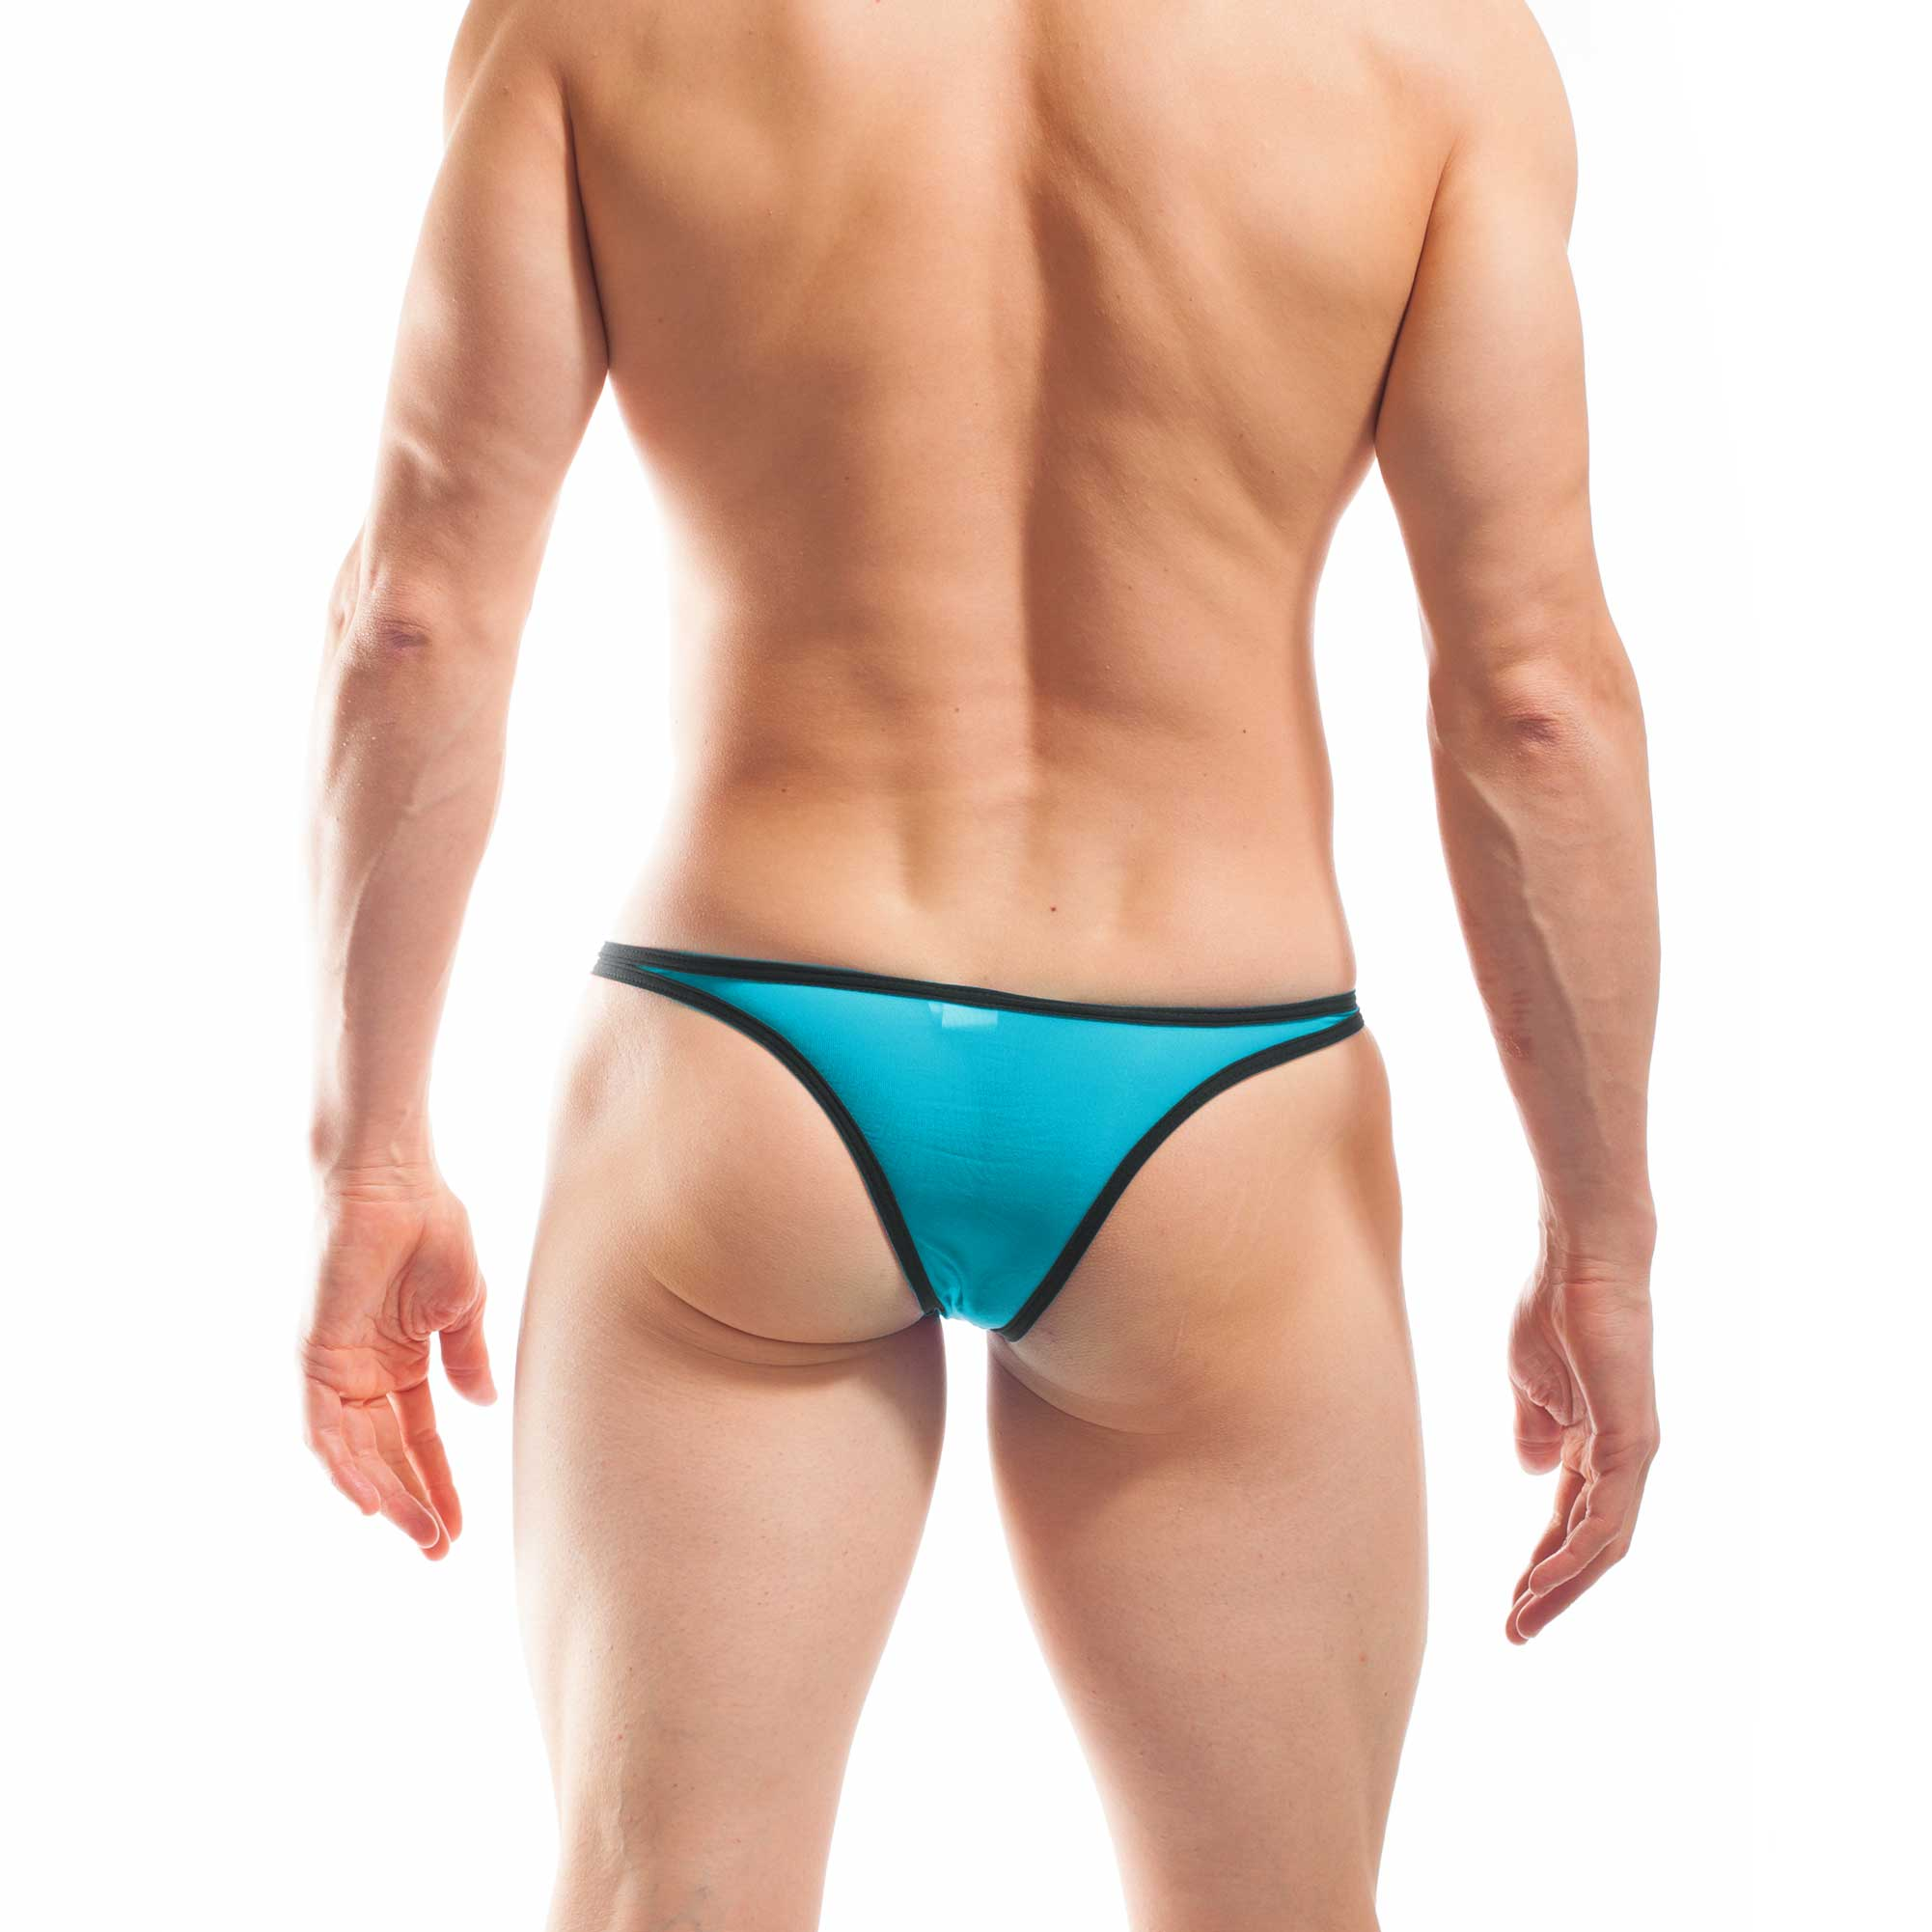 BEUN STRIPE MINI PUSH UP TANGA, Tanga, brasil, knappe Badehose, swim trunks, kontrast Ränder, schwarze Börtchen, eisblau, himmelblau, hellblau, blau